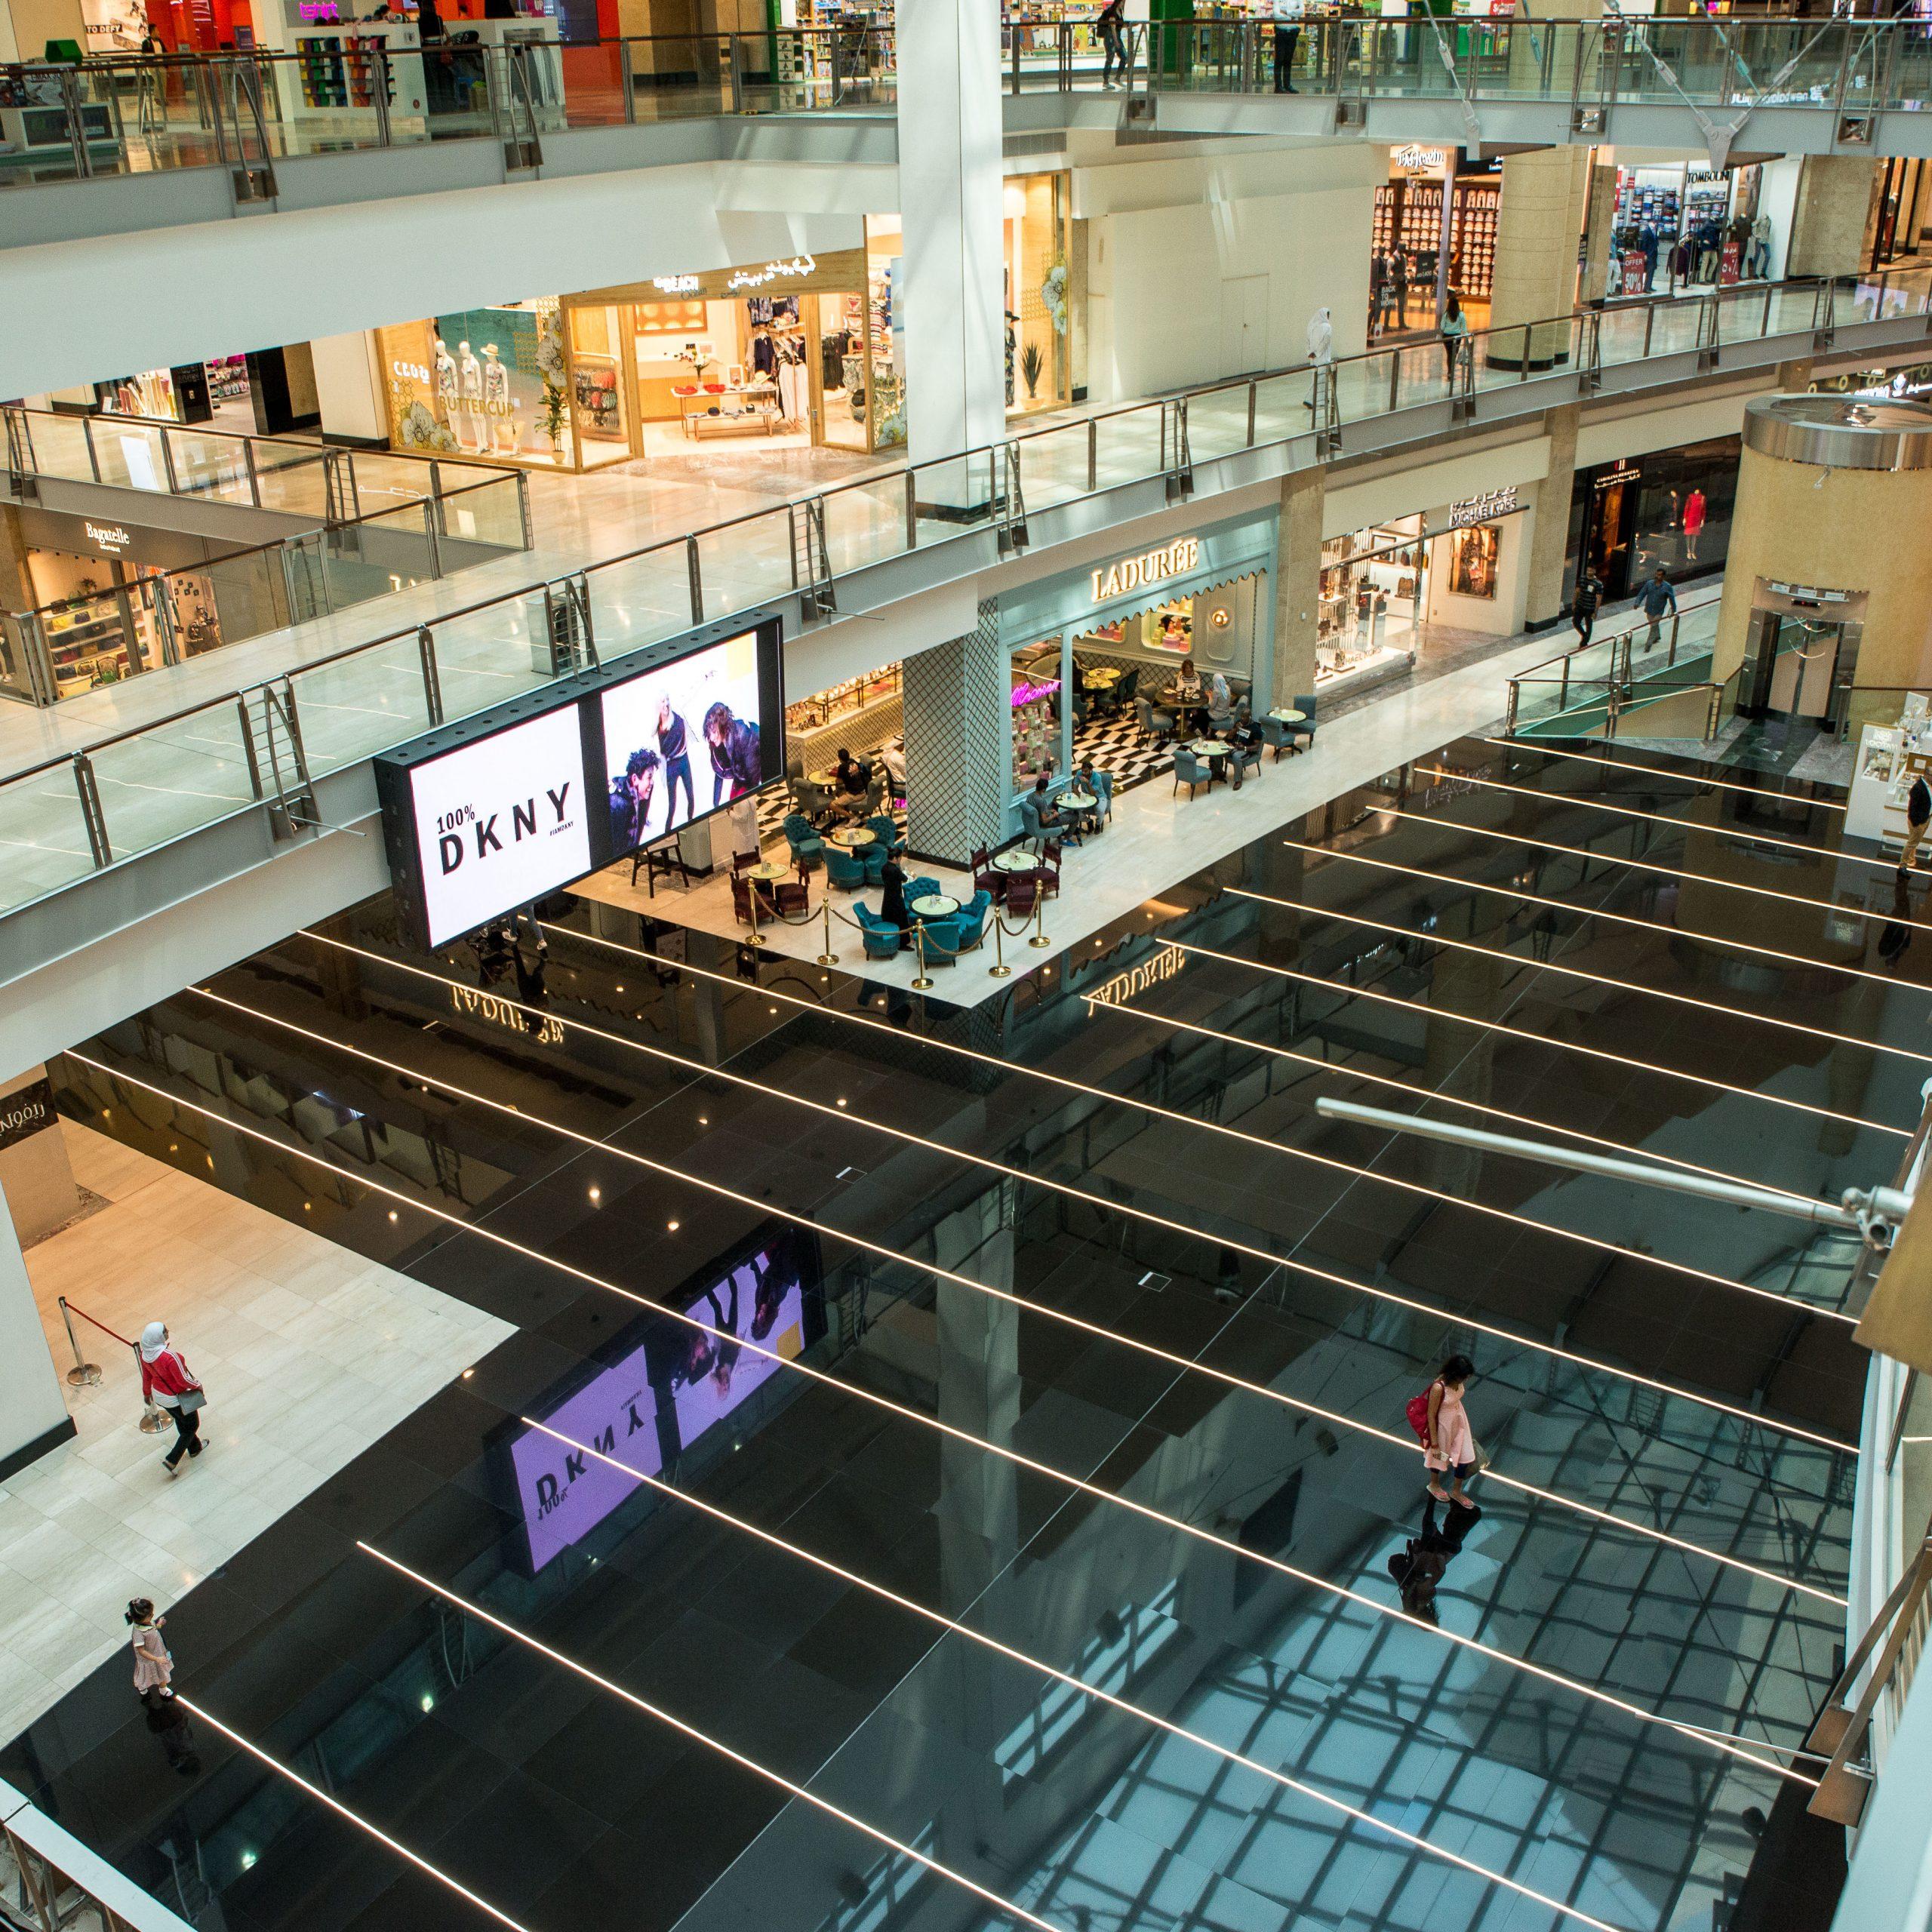 Abu Dhabi Mall – Abu Dhabi, UAE